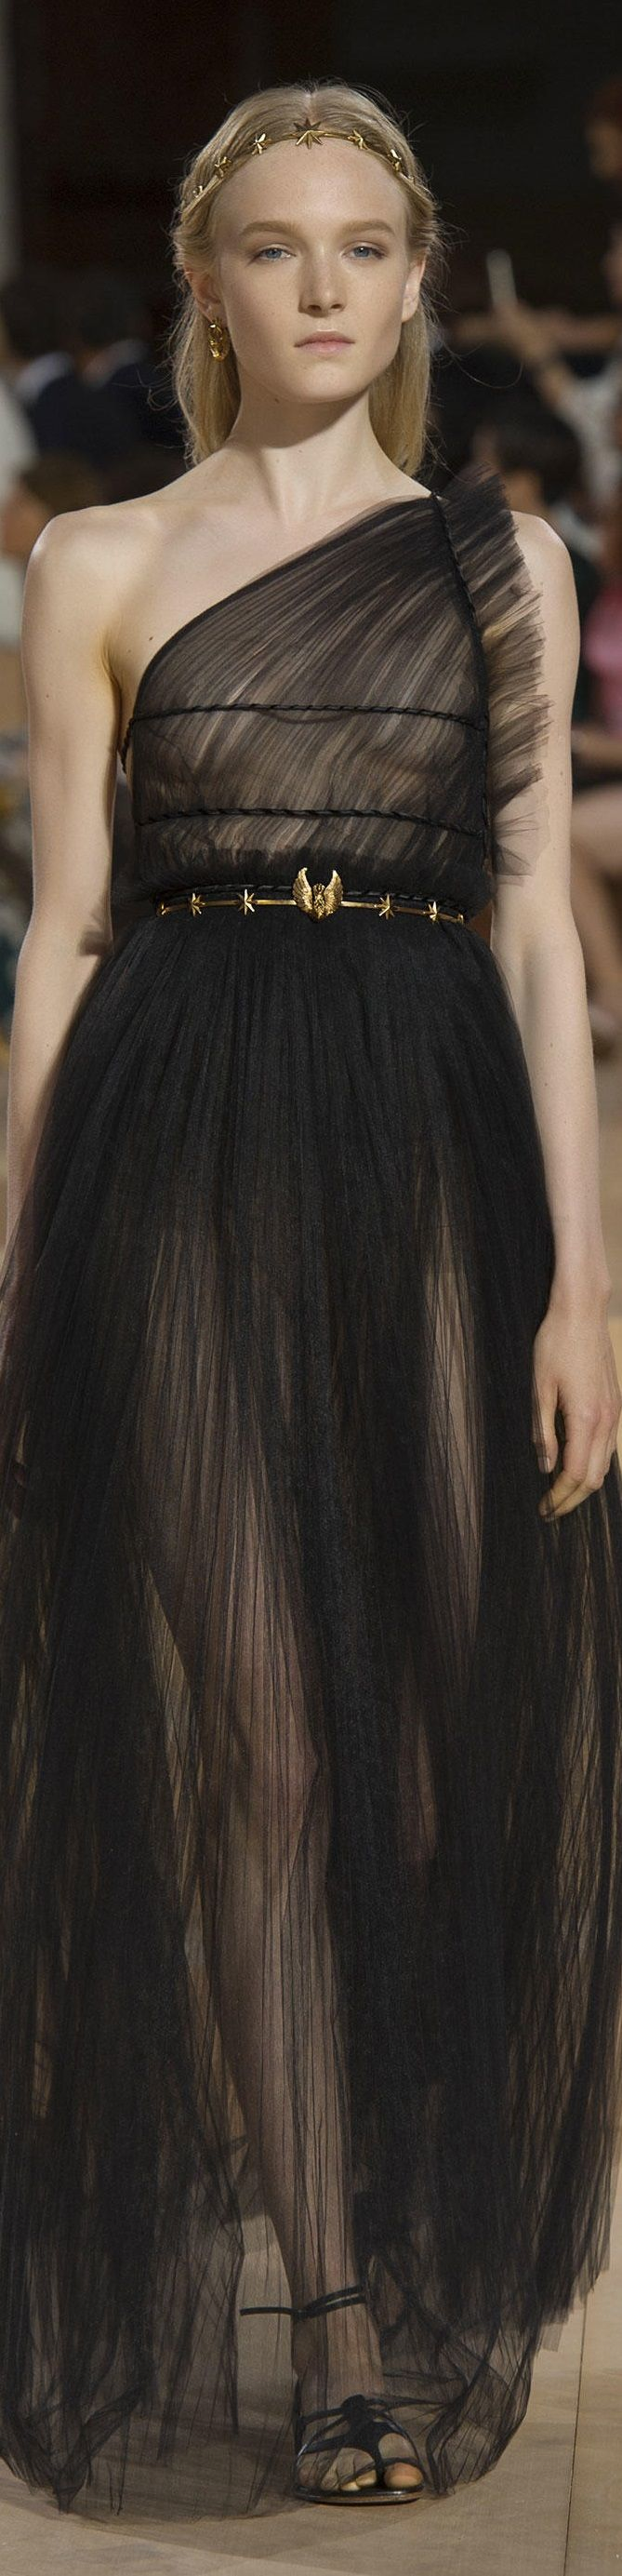 Valentino FW 2015 couture #highfashion #inspiration #moderndesign luxury design, luxury, fashion. Visit www.memoir.pt